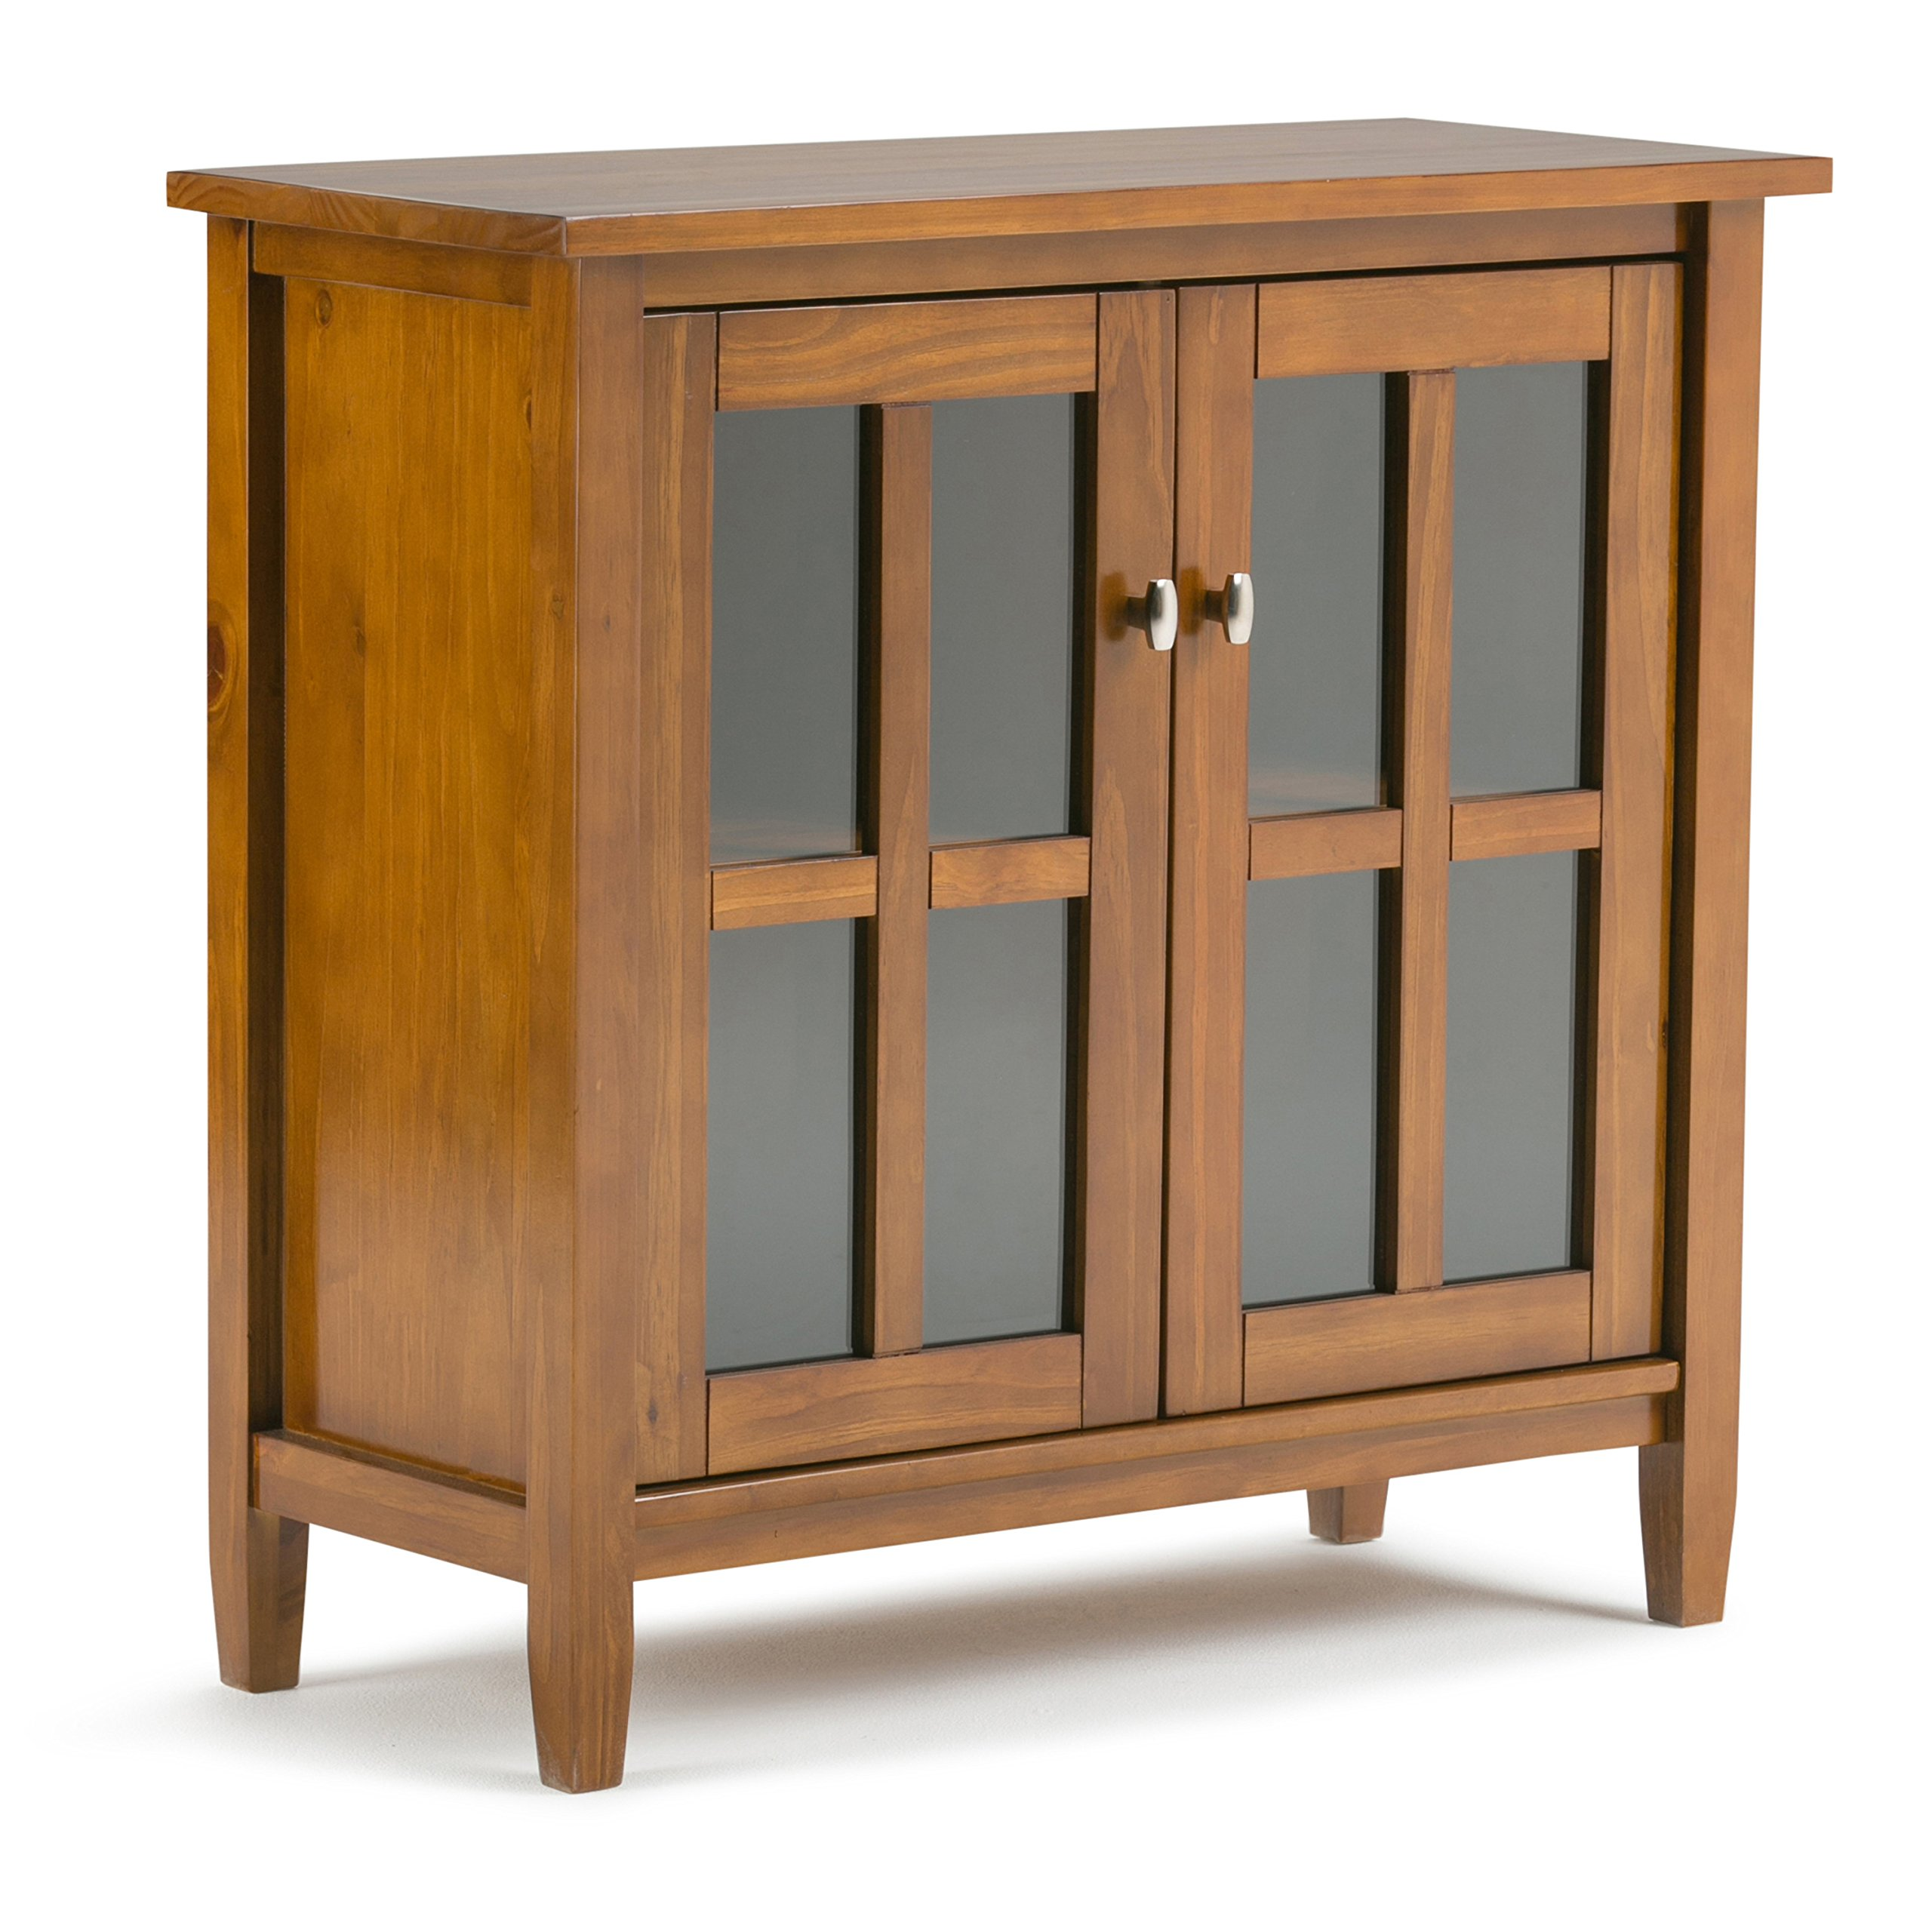 Simpli Home Warm Shaker Solid Wood Low Storage Cabinet, Honey Brown